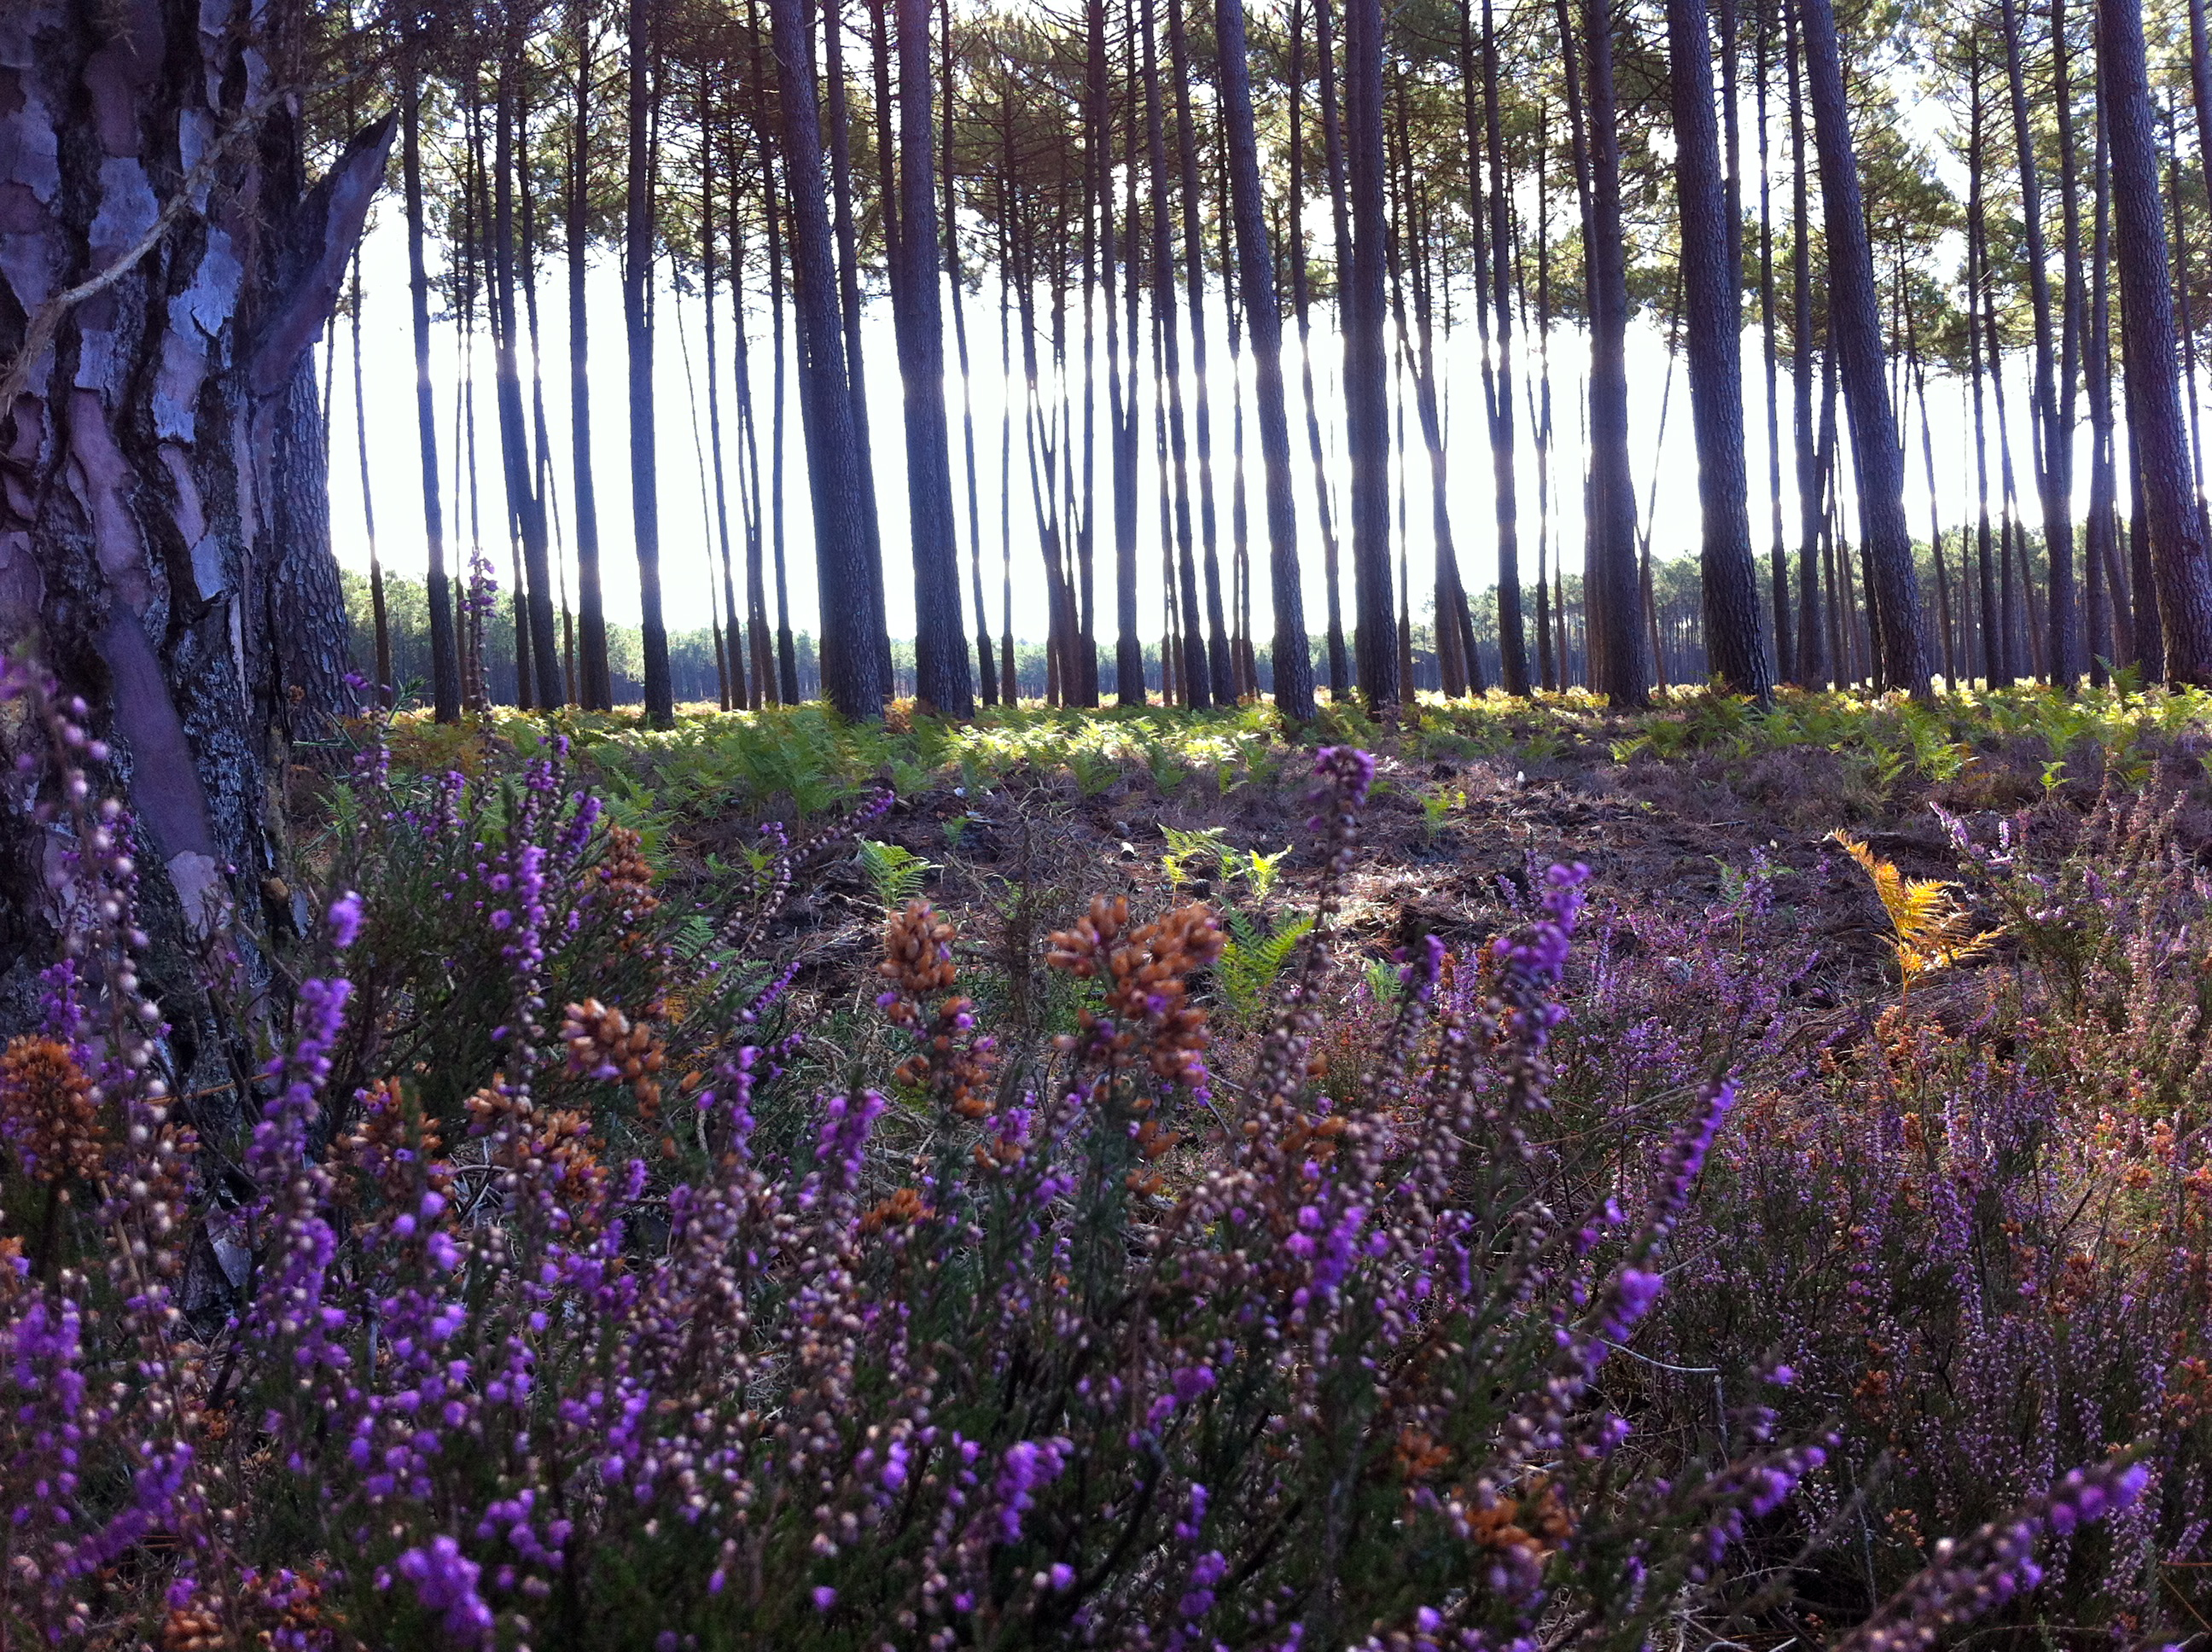 L'Océan des Landes - Bruyère en forêt